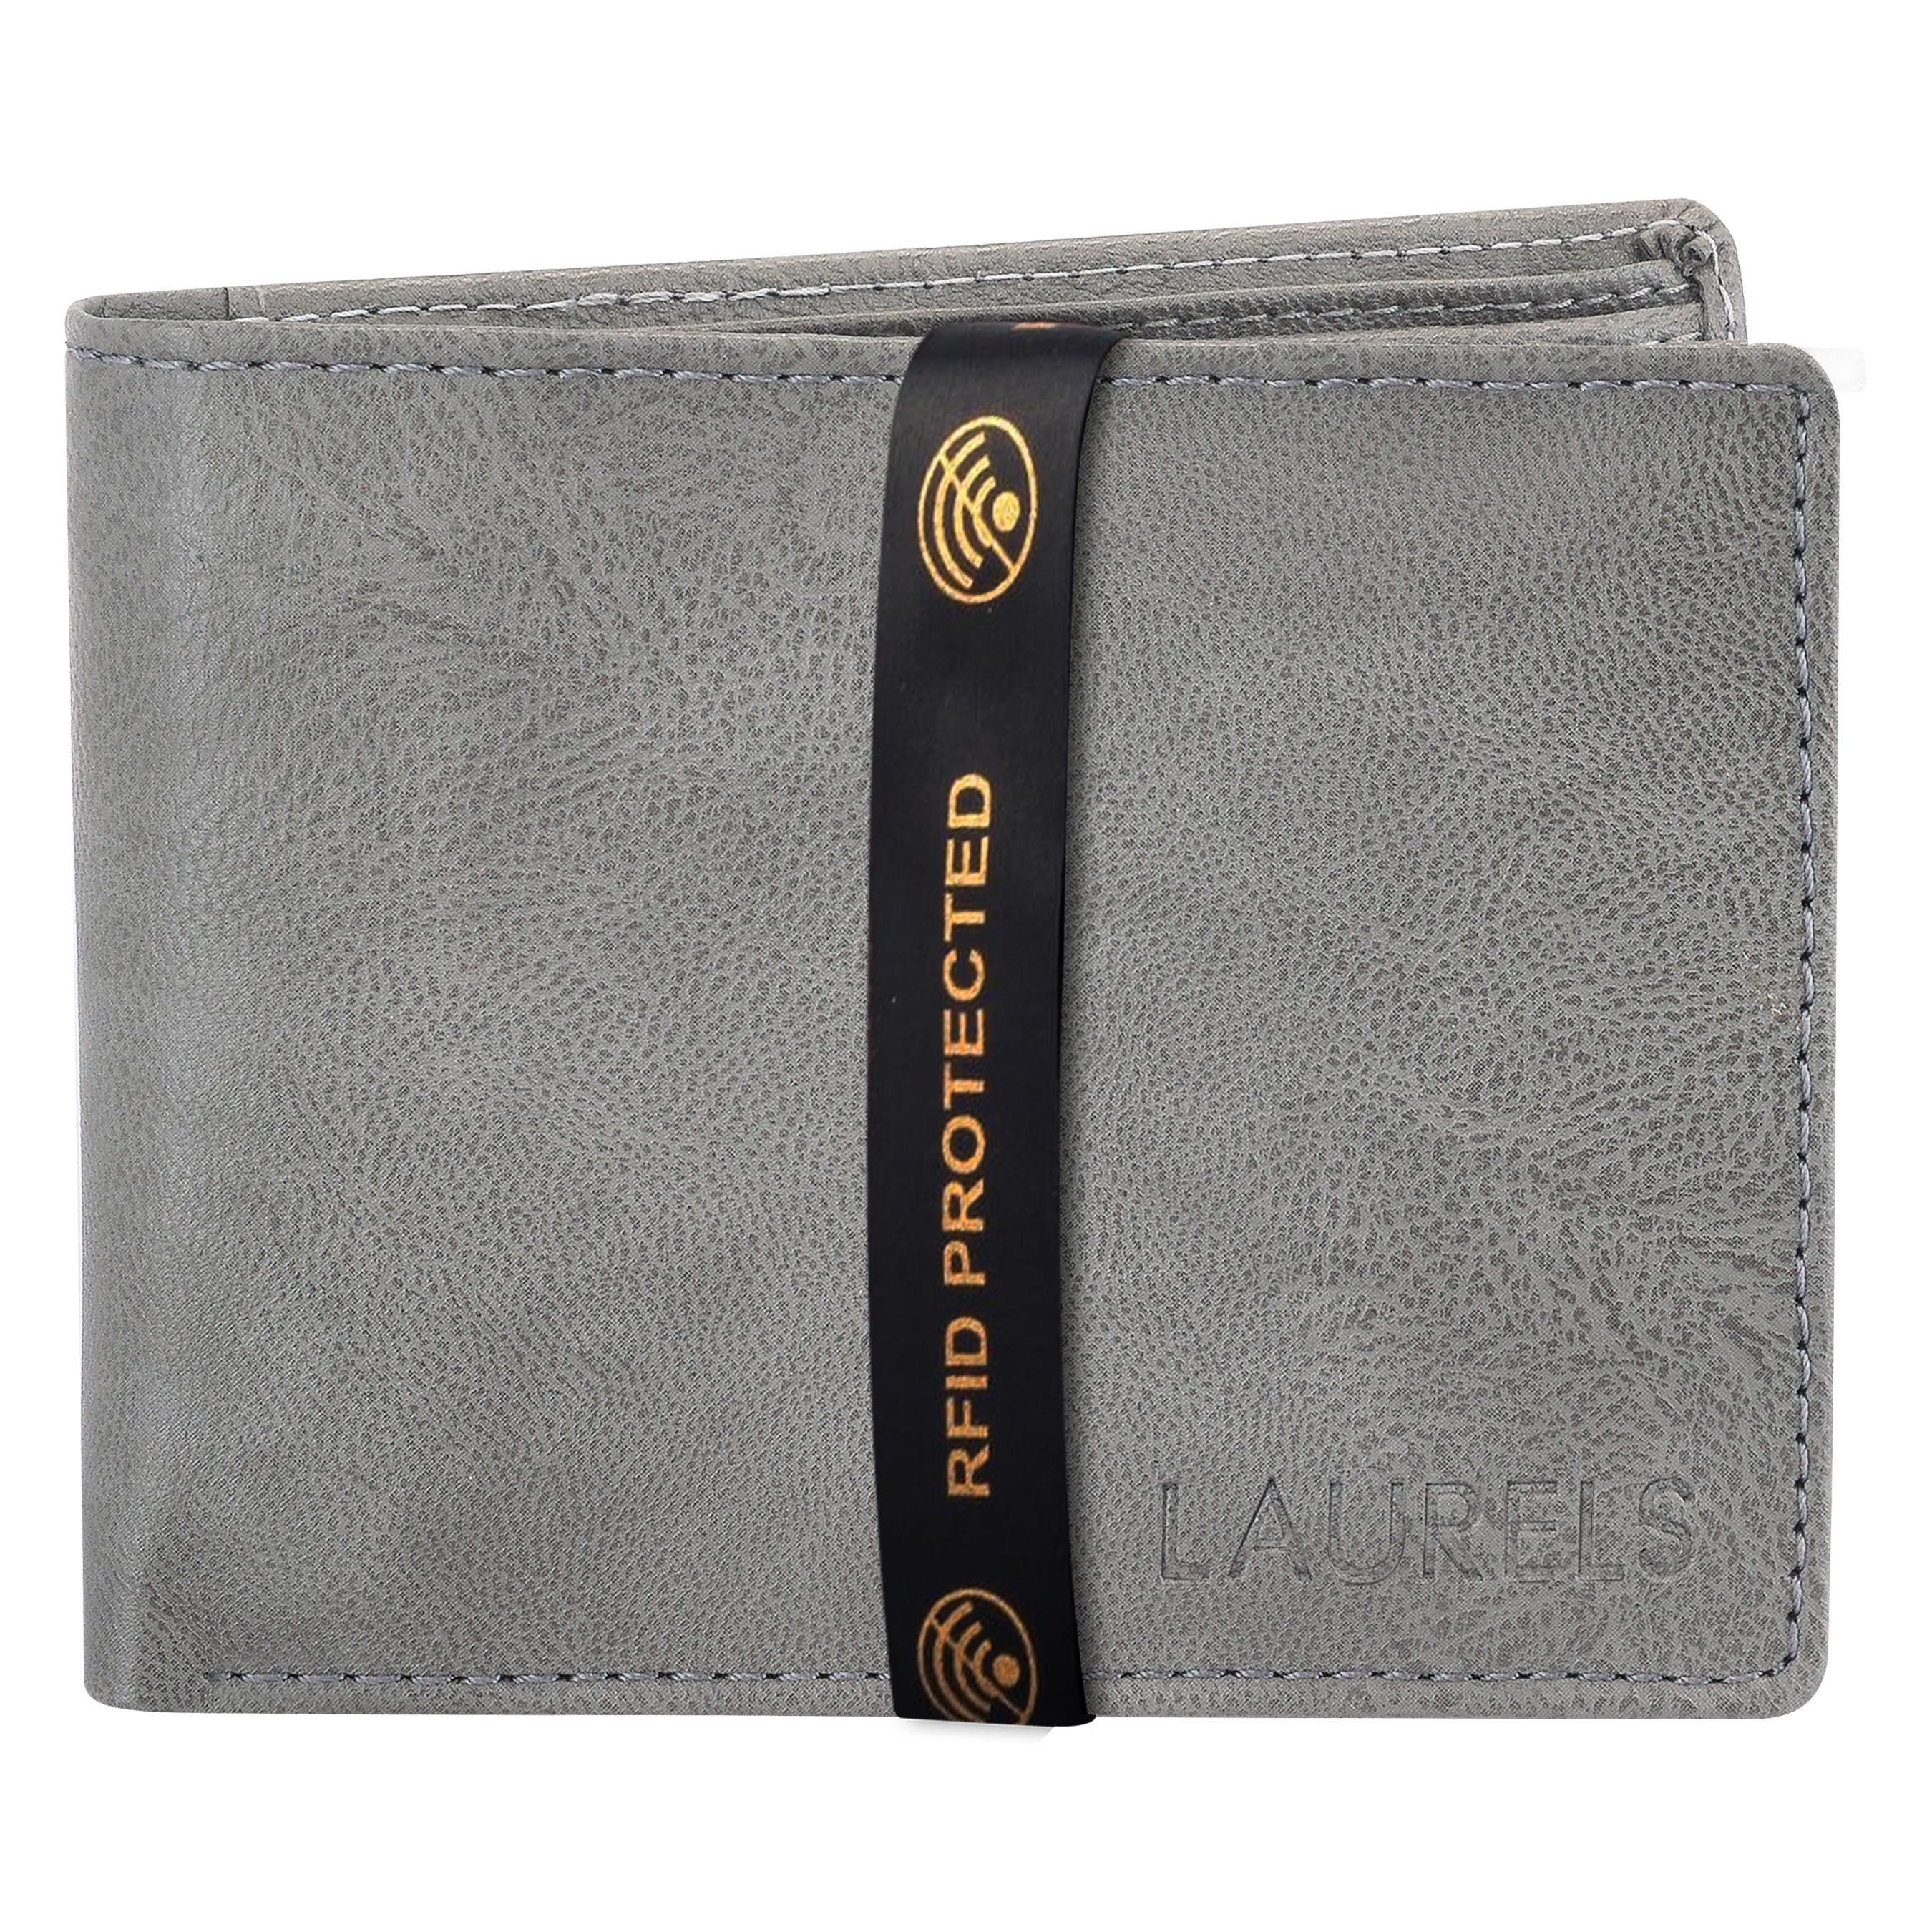 Laurels | Laurels Brye Grey Vegan Leather Men Wallet With RFID Protection.